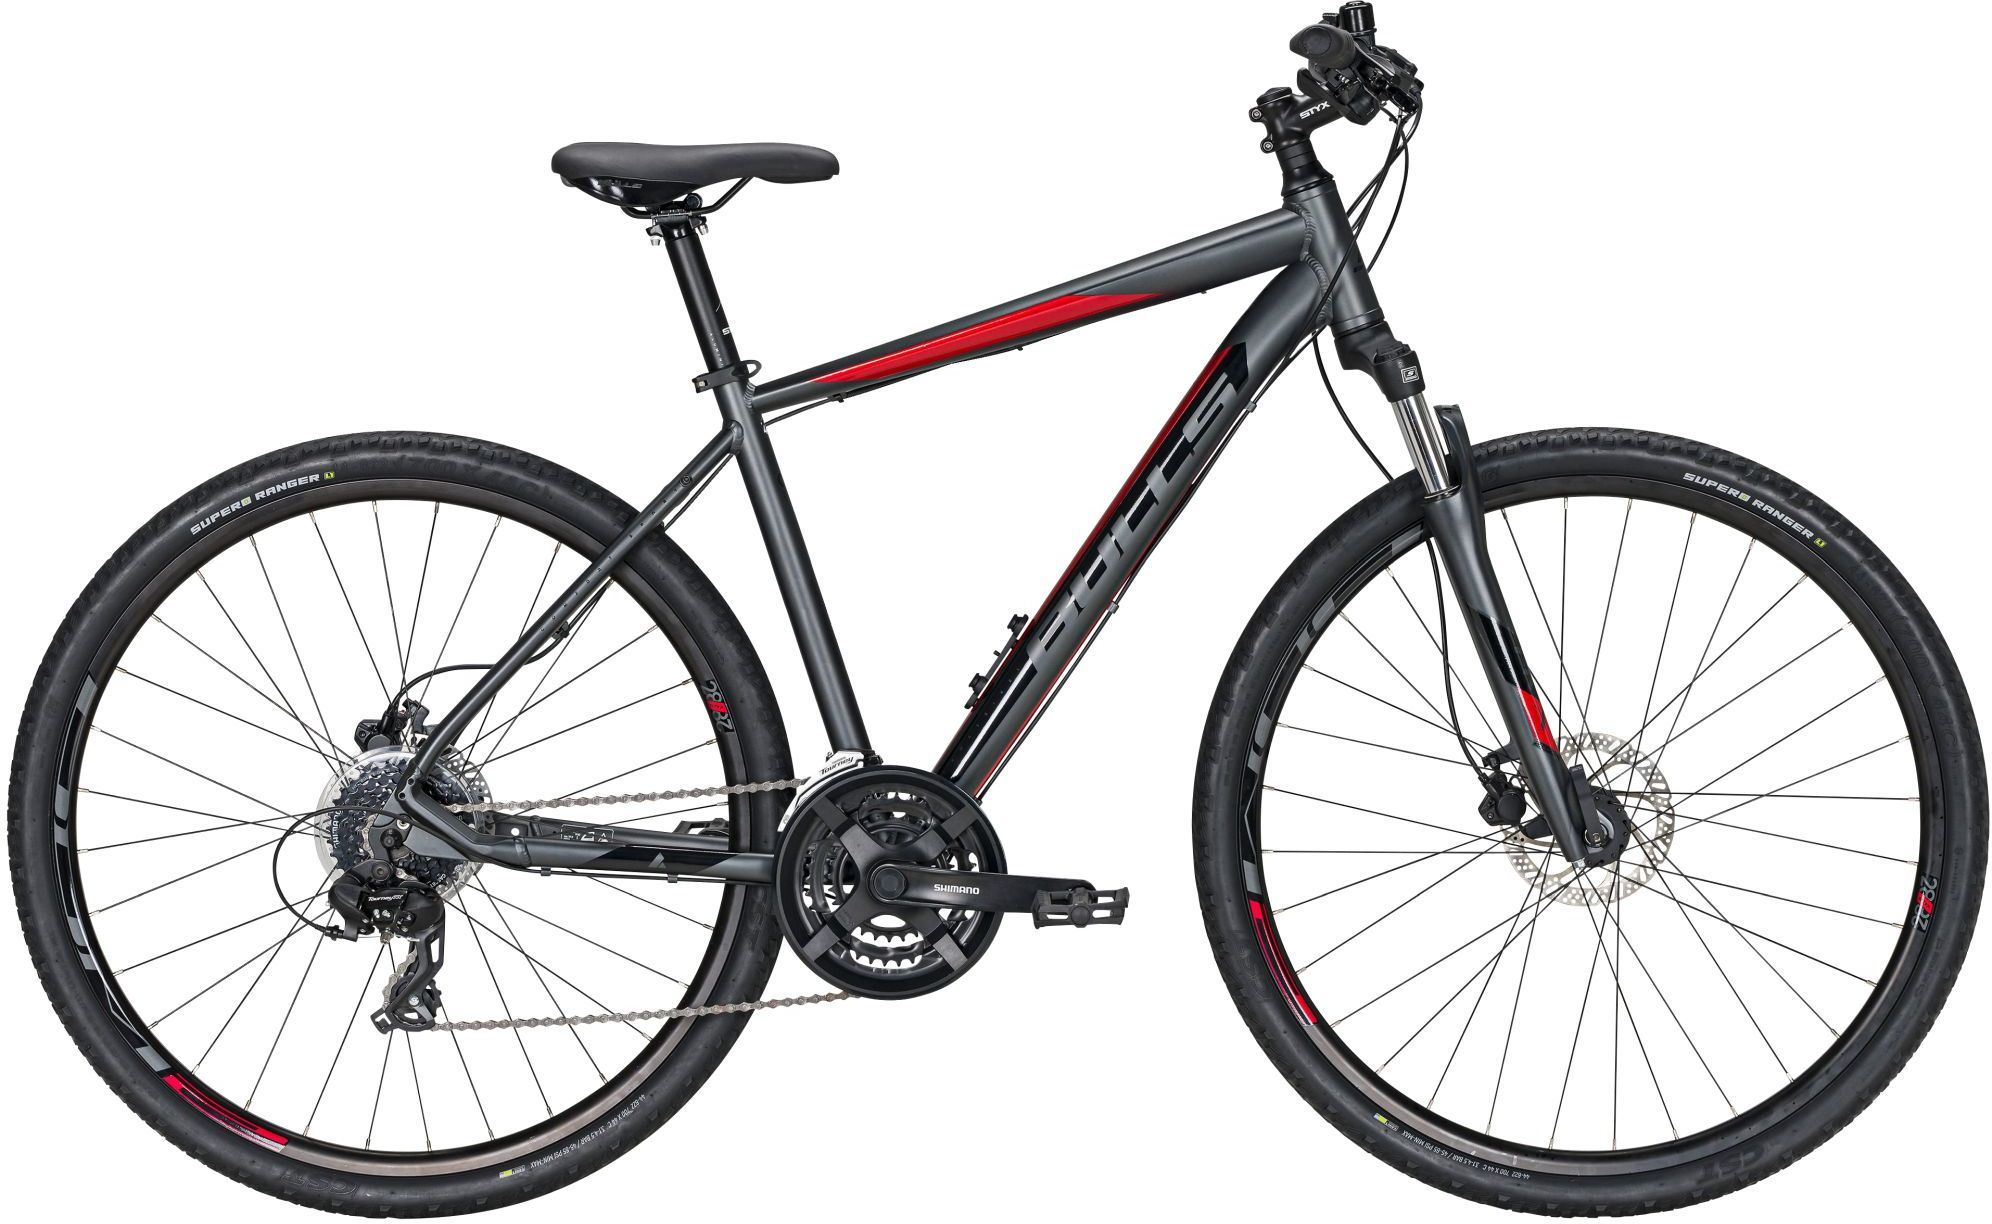 bici da uomo BULLS Crossbike 1 cambio a 24 marce grigio opaco